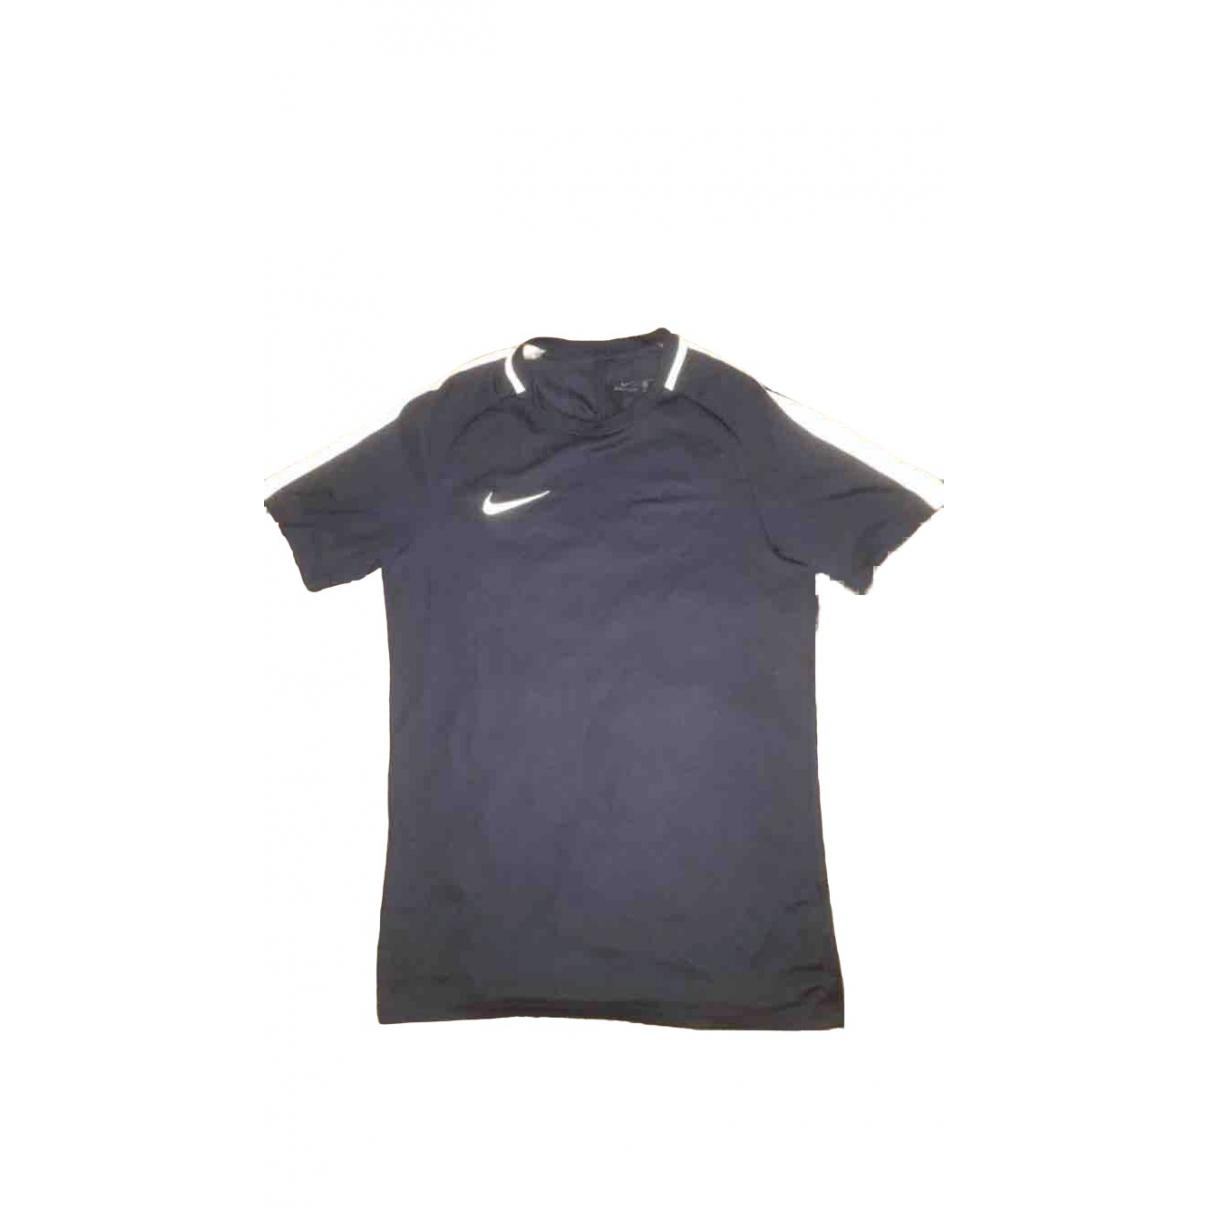 Nike - Tee shirts   pour homme - bleu